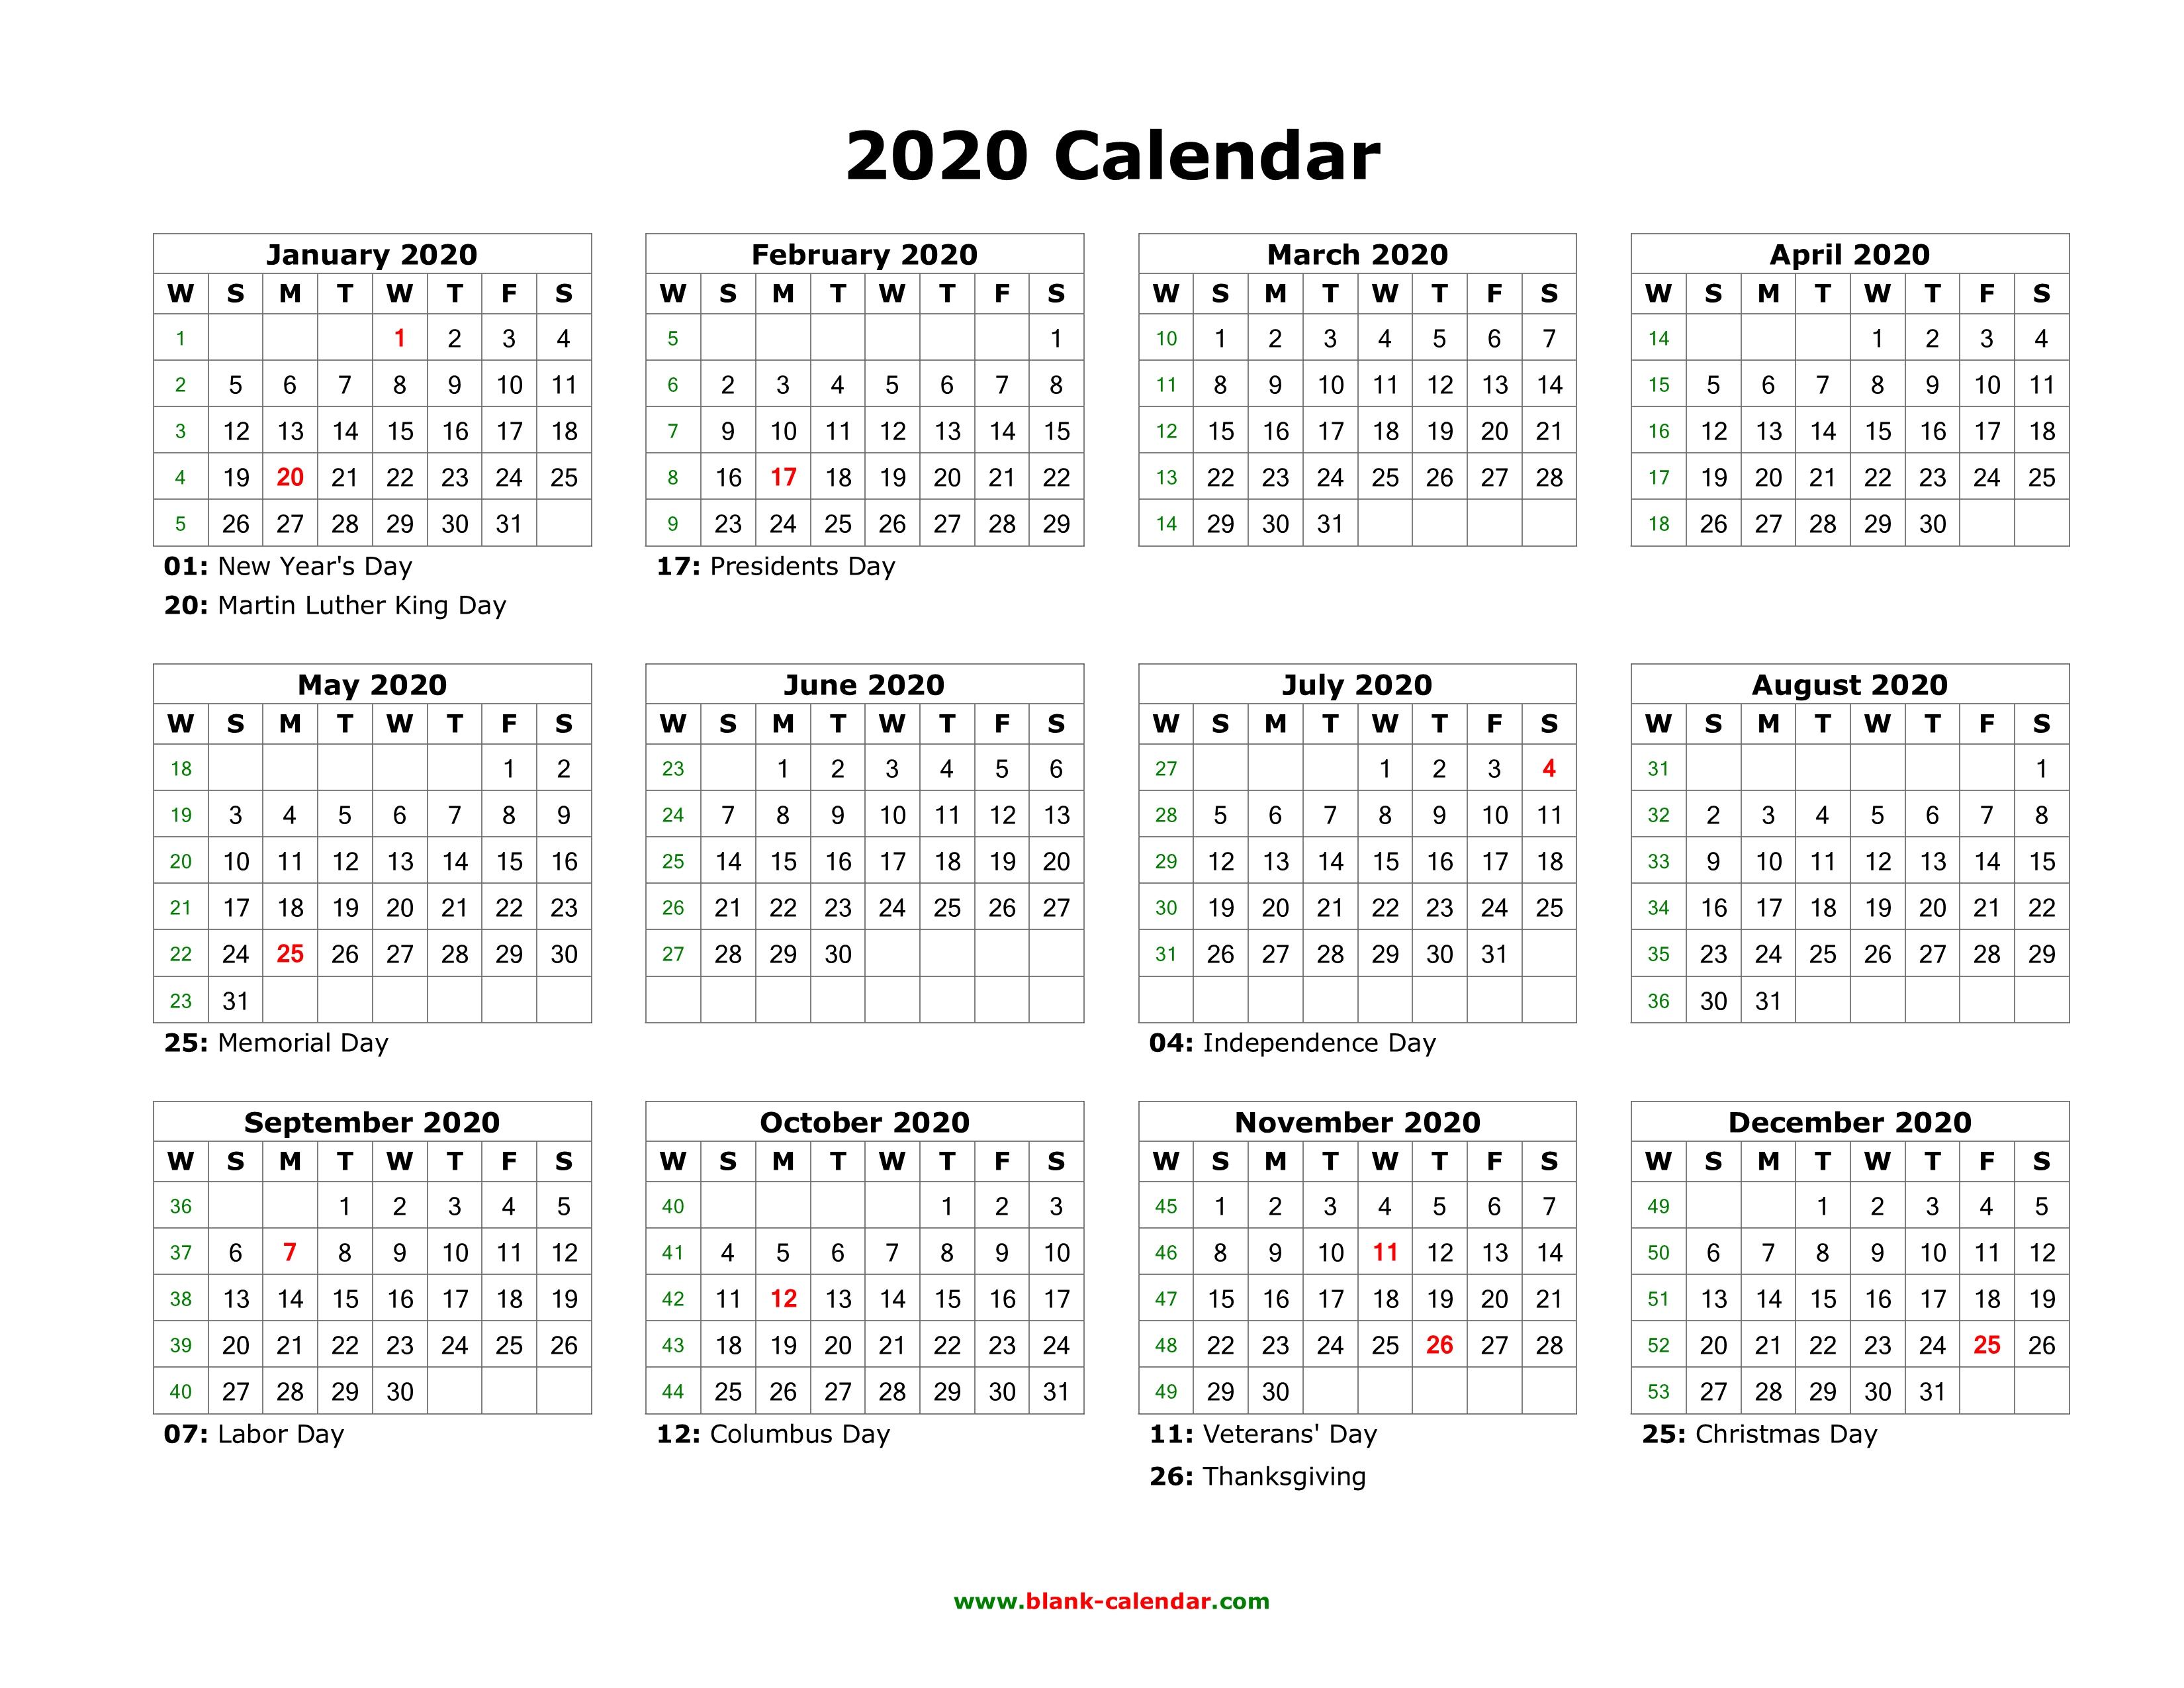 Blank Calendar 2020 | Free Download Calendar Templates with Free Template 2020 Sunday To Saturday Calendar